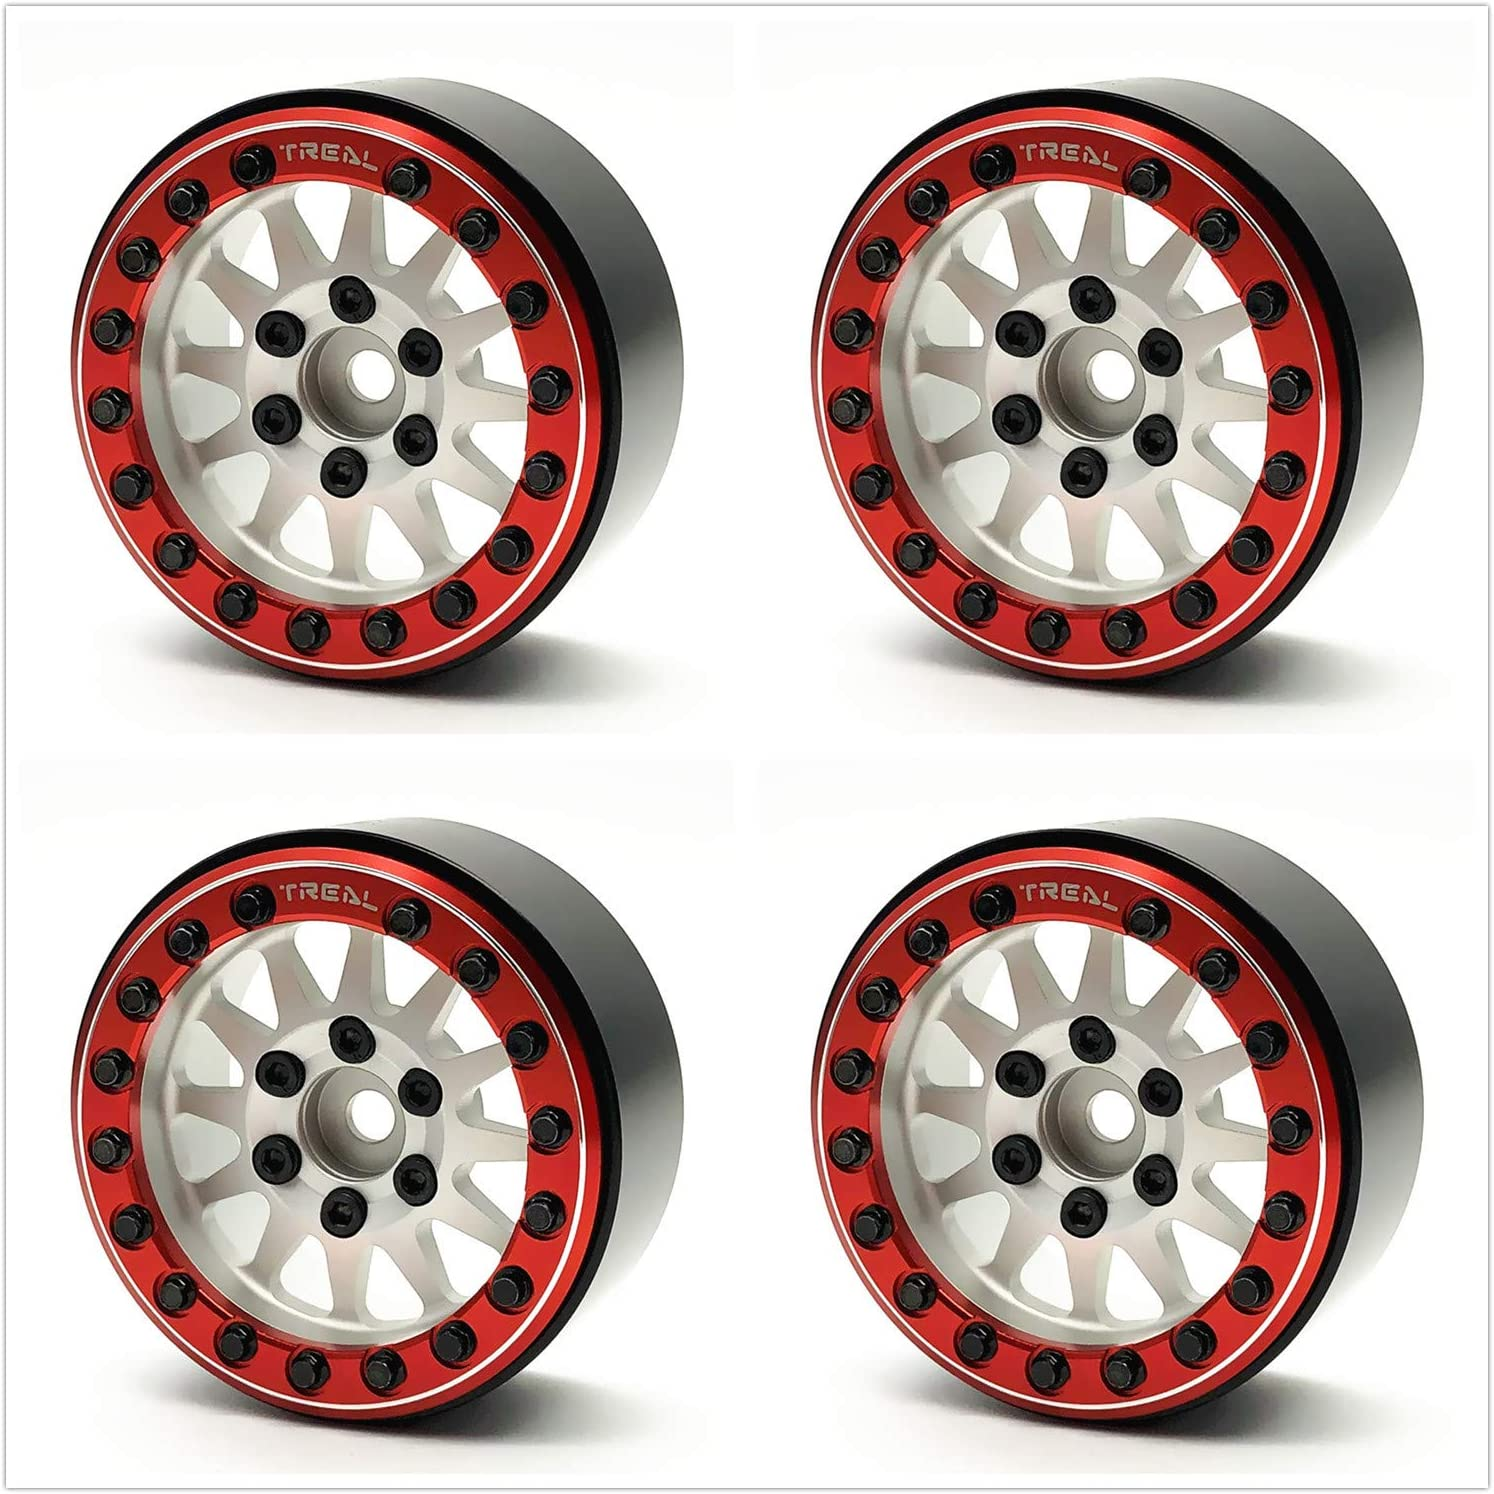 Treal 1.9 beadlock Regular discount At the price Wheels 4P-Set 1:10 Alloy for Crawler